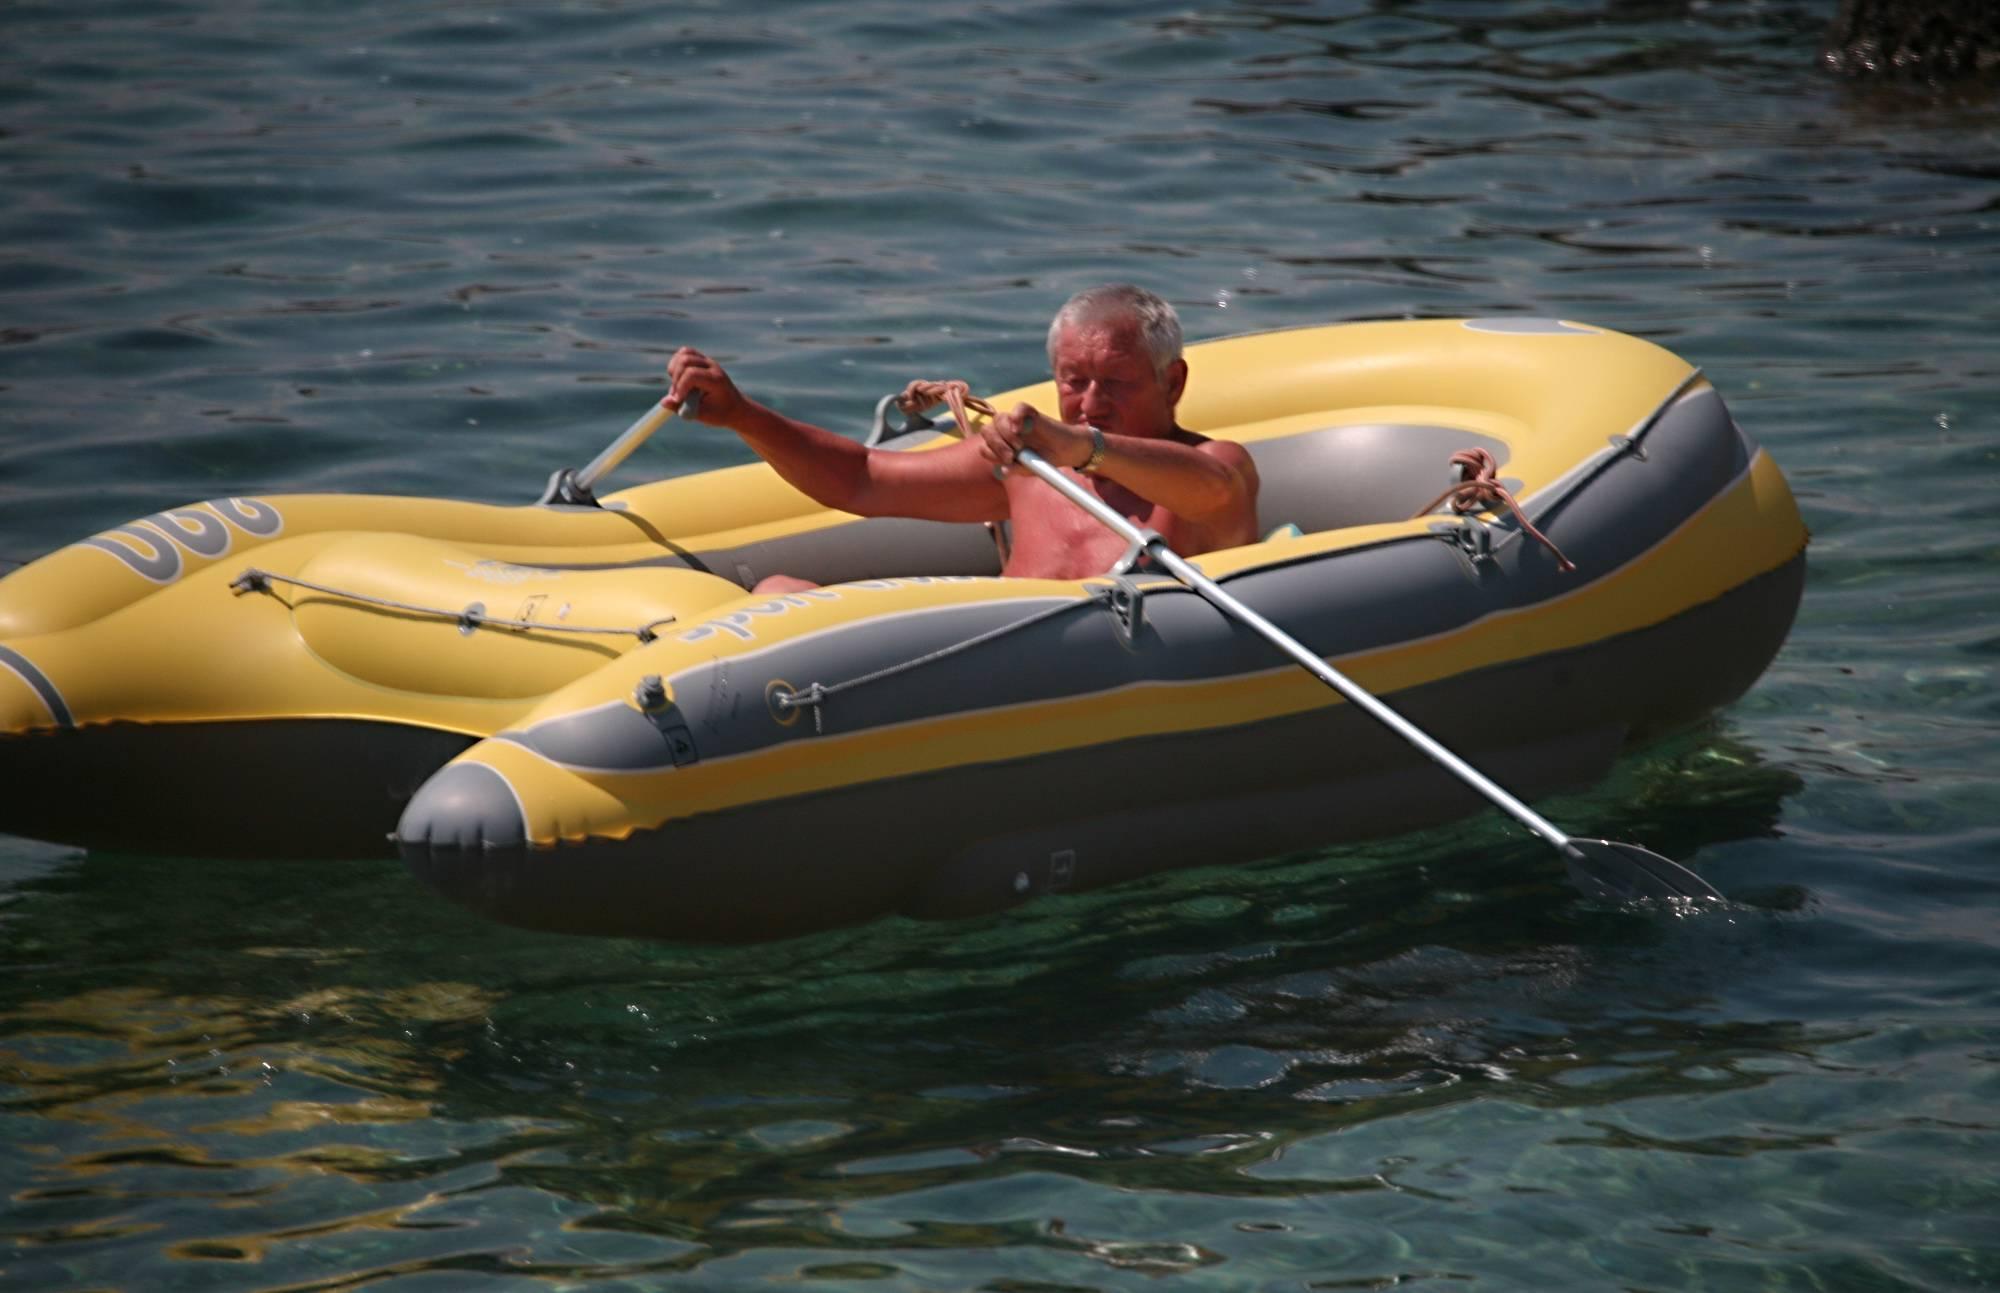 Purenudism Gallery-Lone Nudist in Yellow Boat - 4